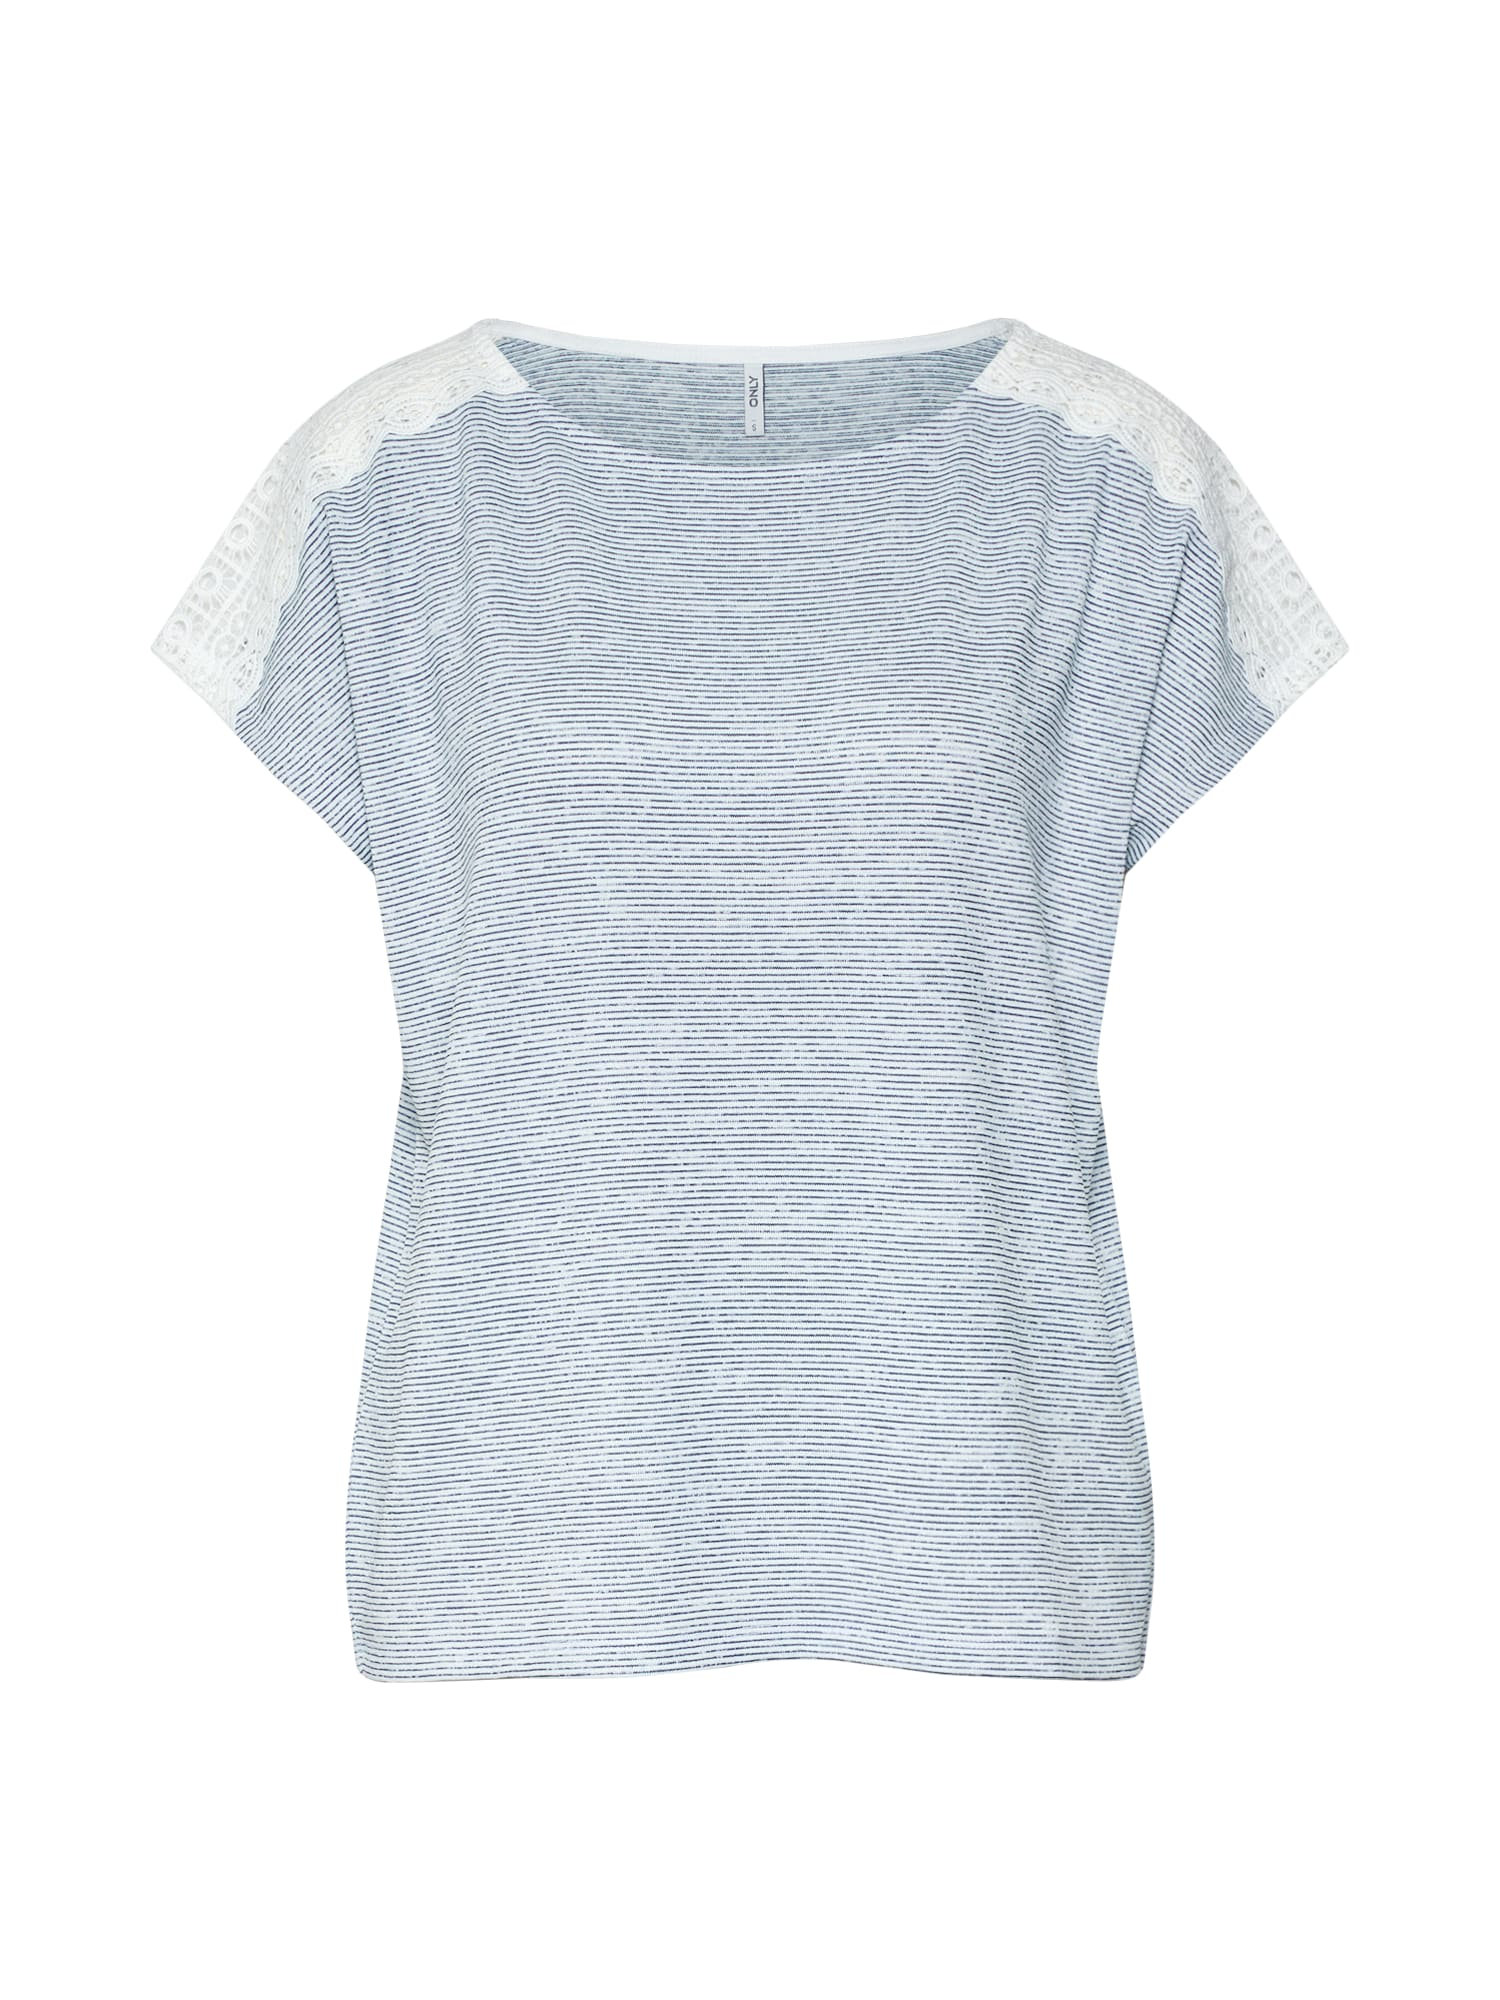 Tričko MIRA modrá bílá ONLY